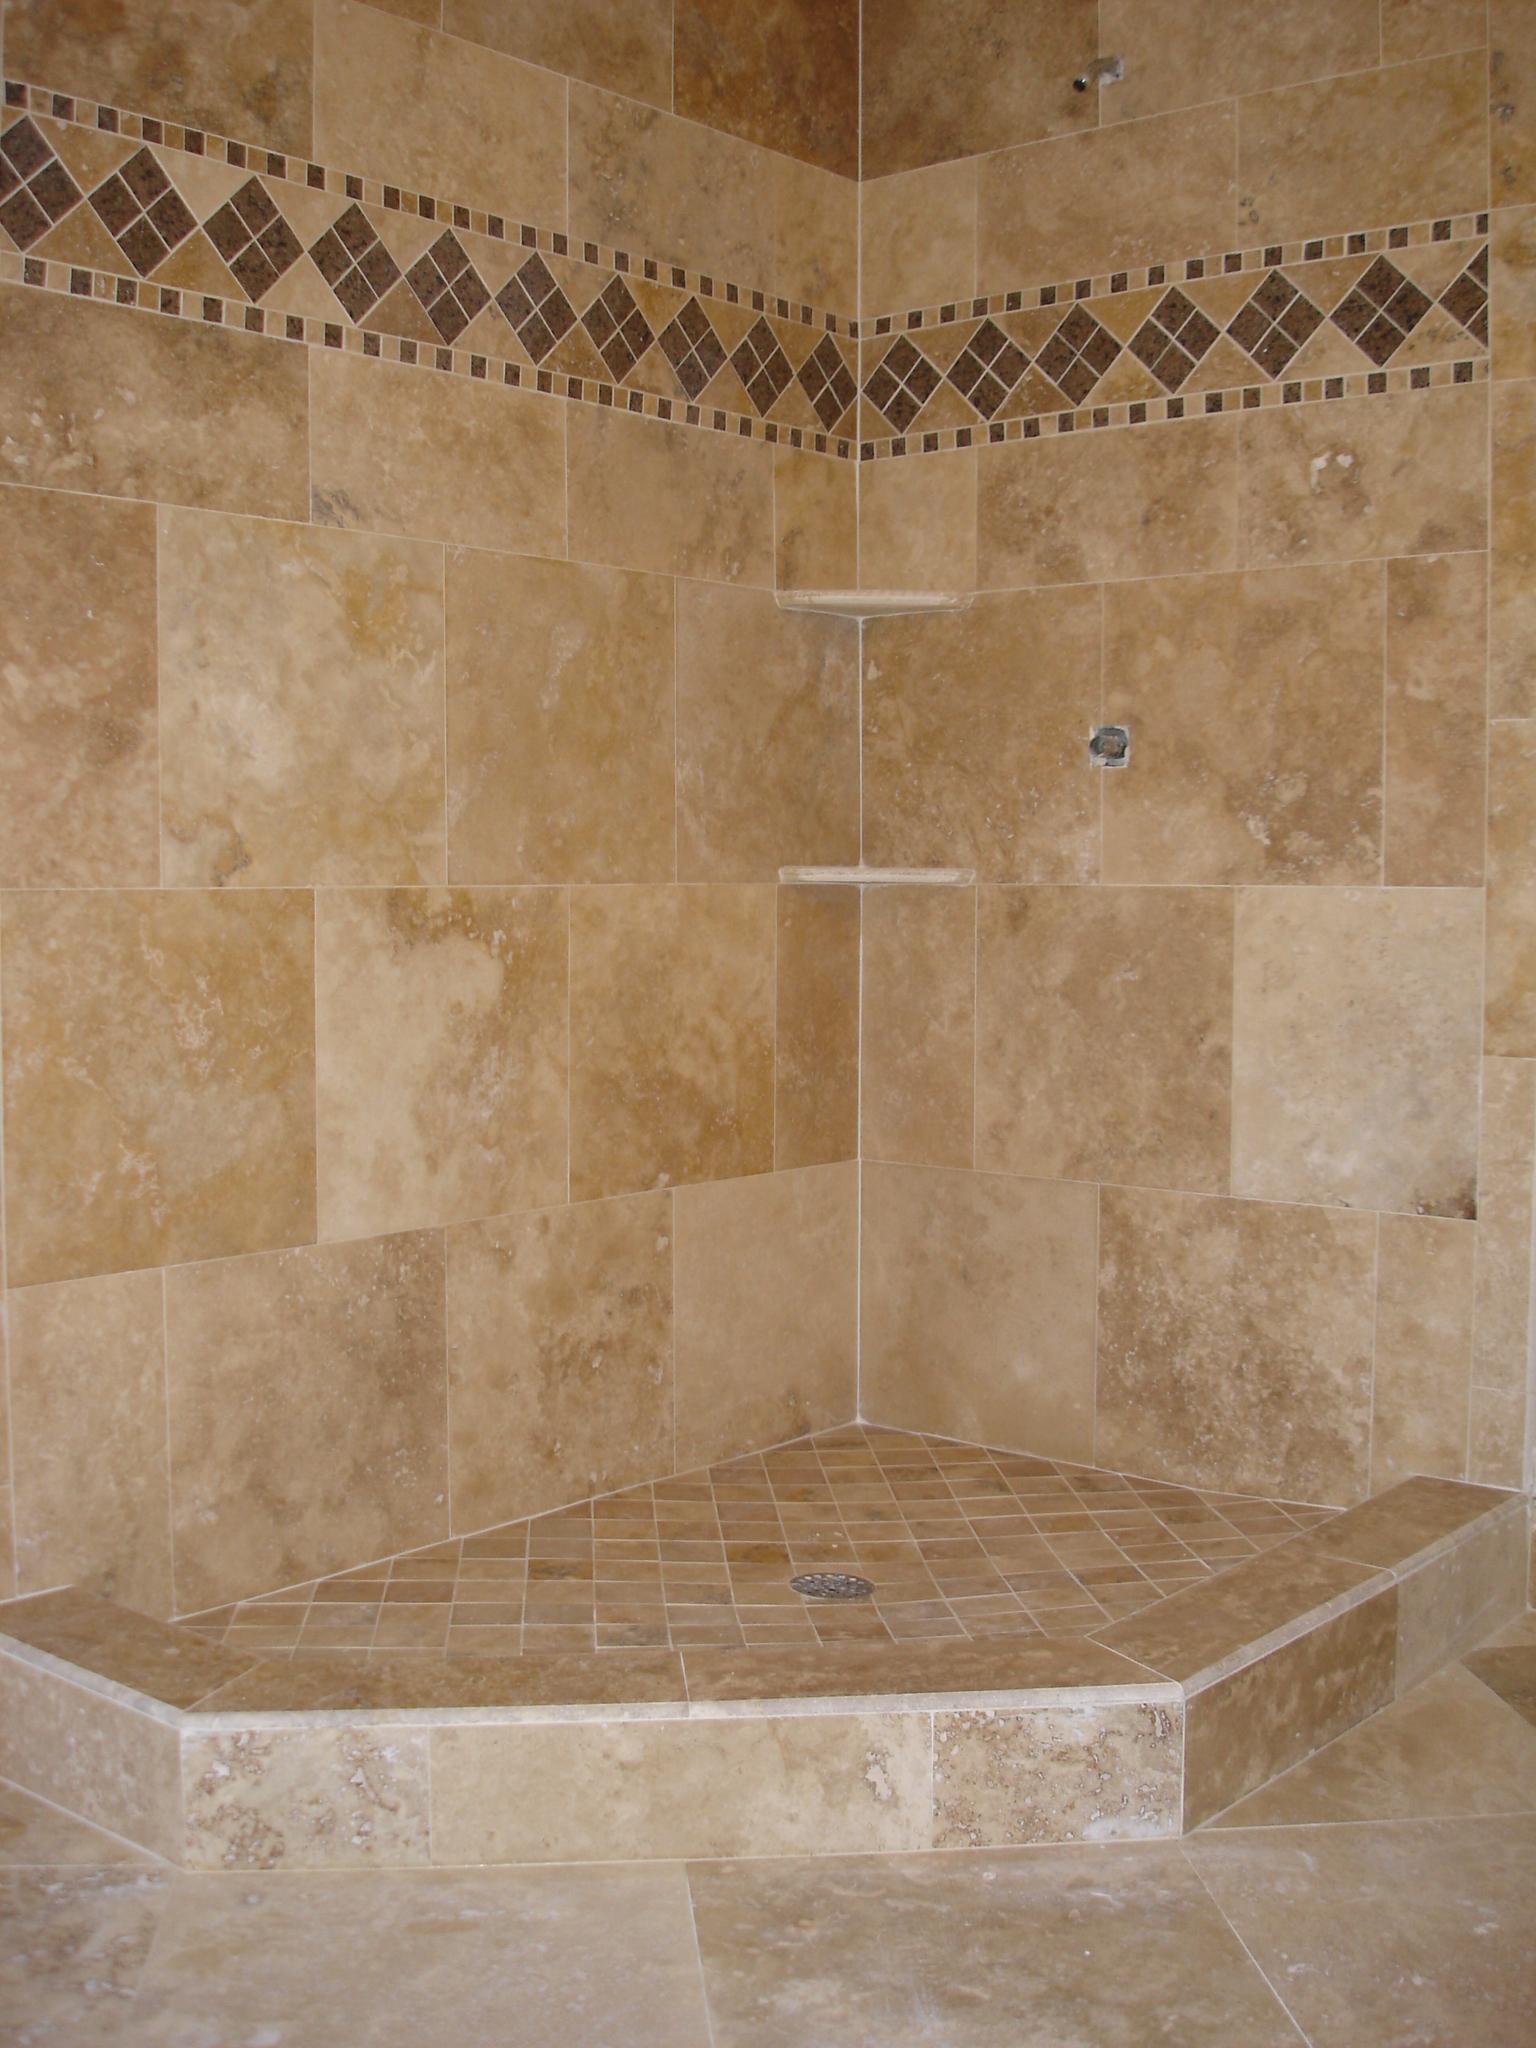 Stone Work - Travertine   Tek Tile - Custom Tile & Designs on Bathroom Tile Pattern Design  id=51202